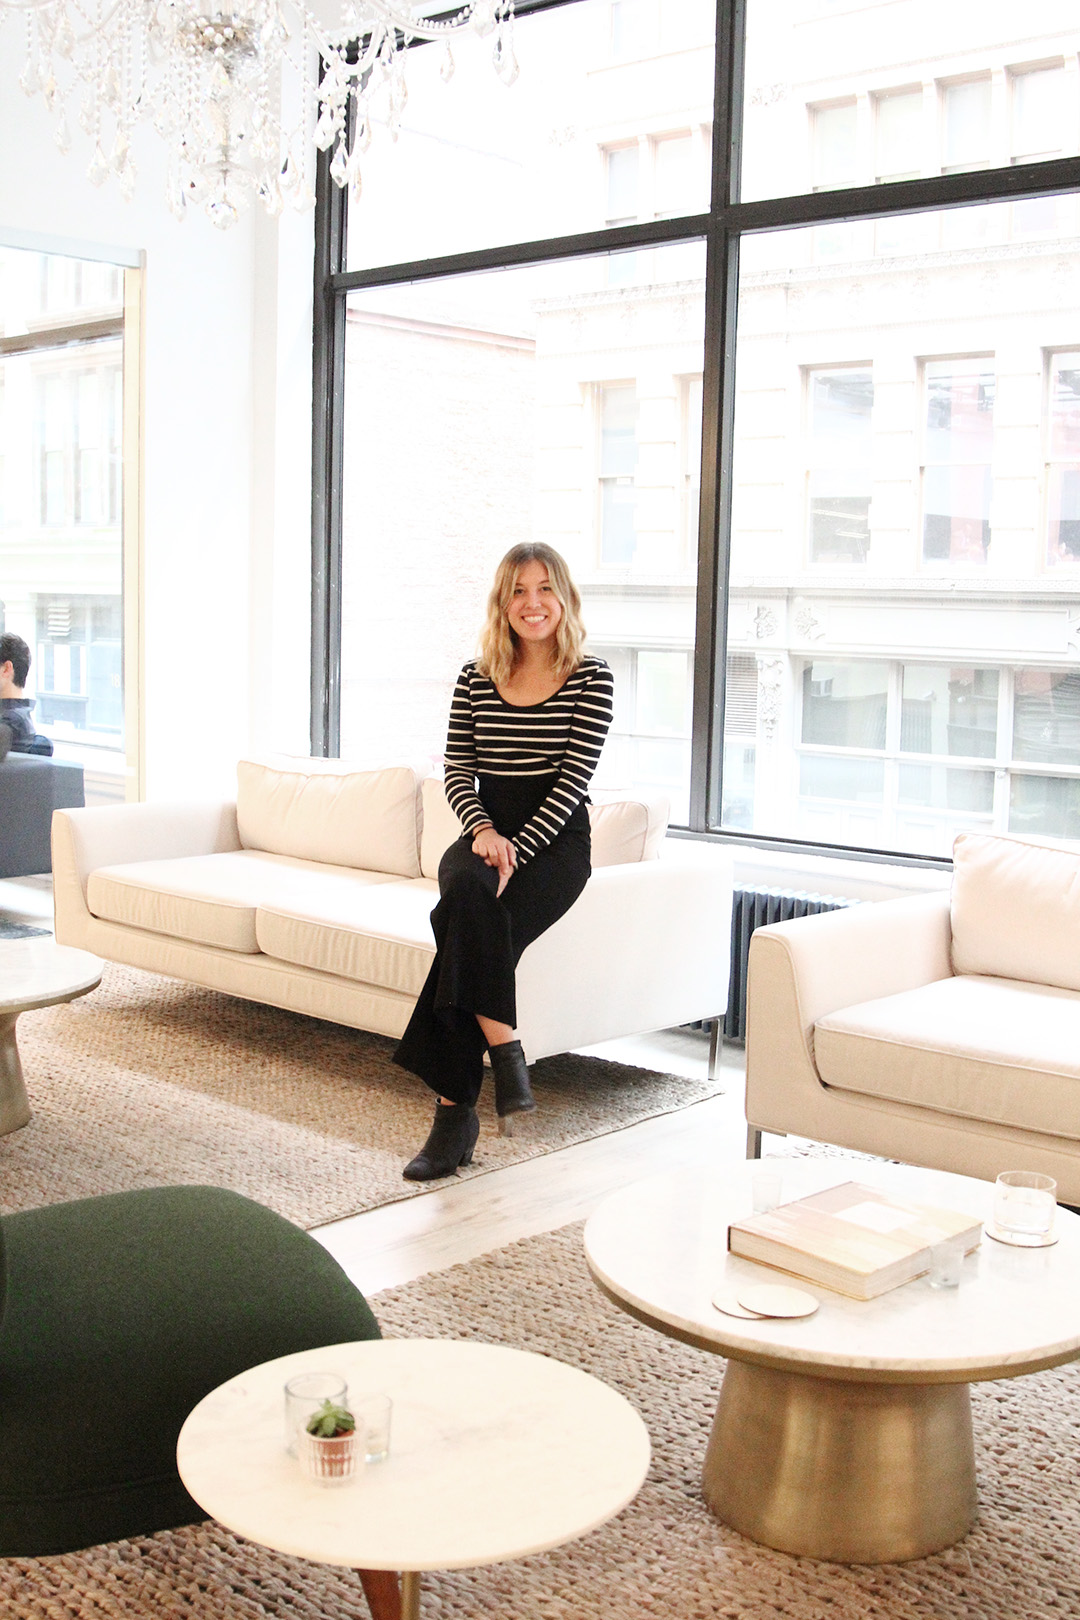 Homepolish director of marketing, Lisa Bubbers